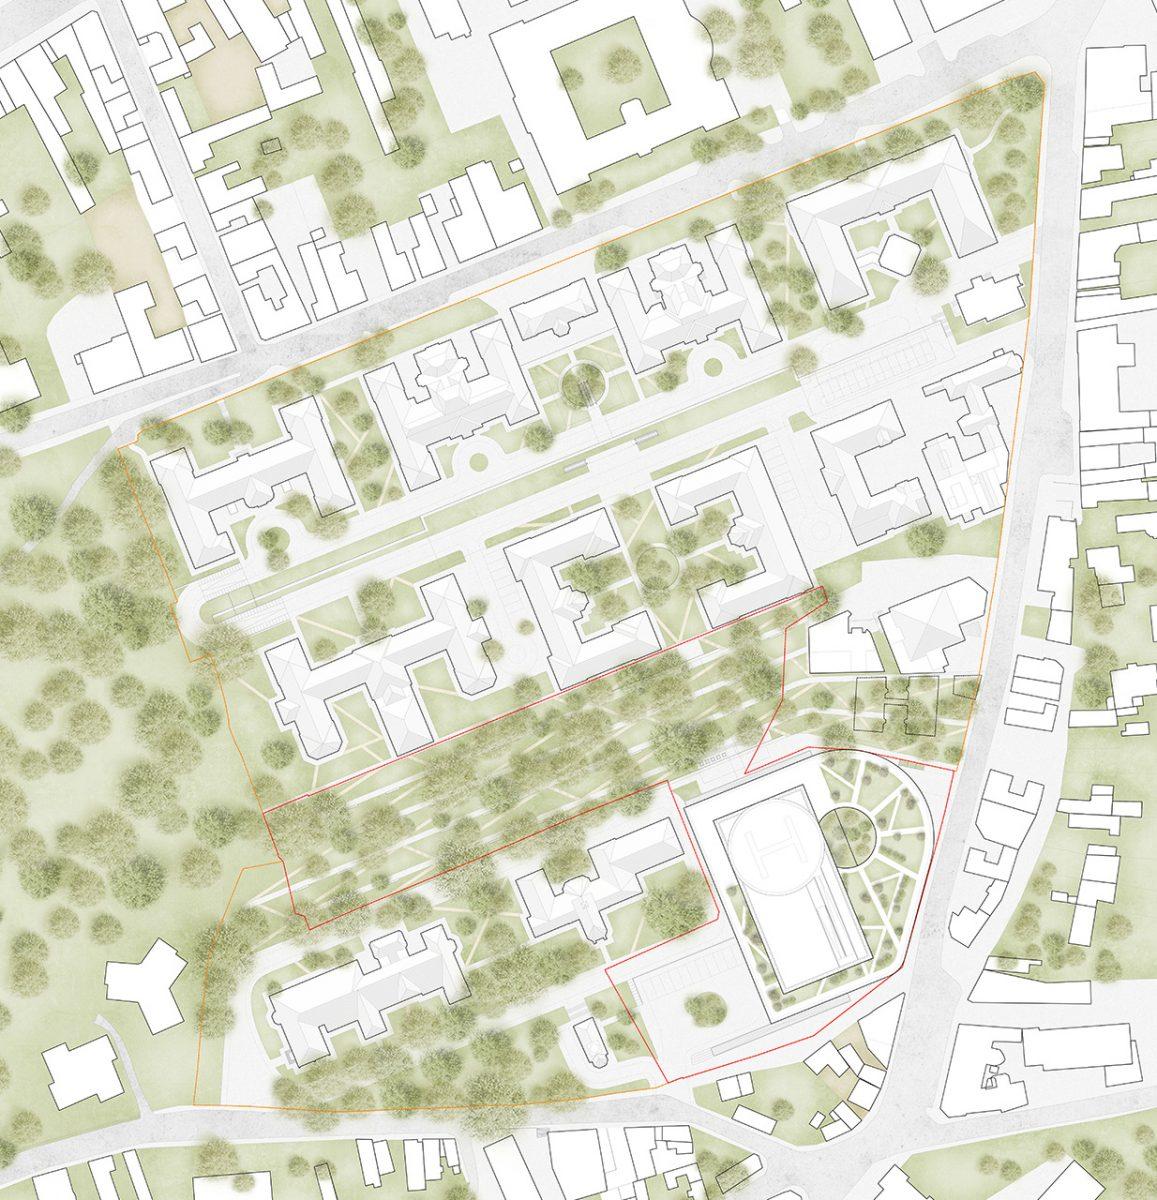 University Hospital Complex plan